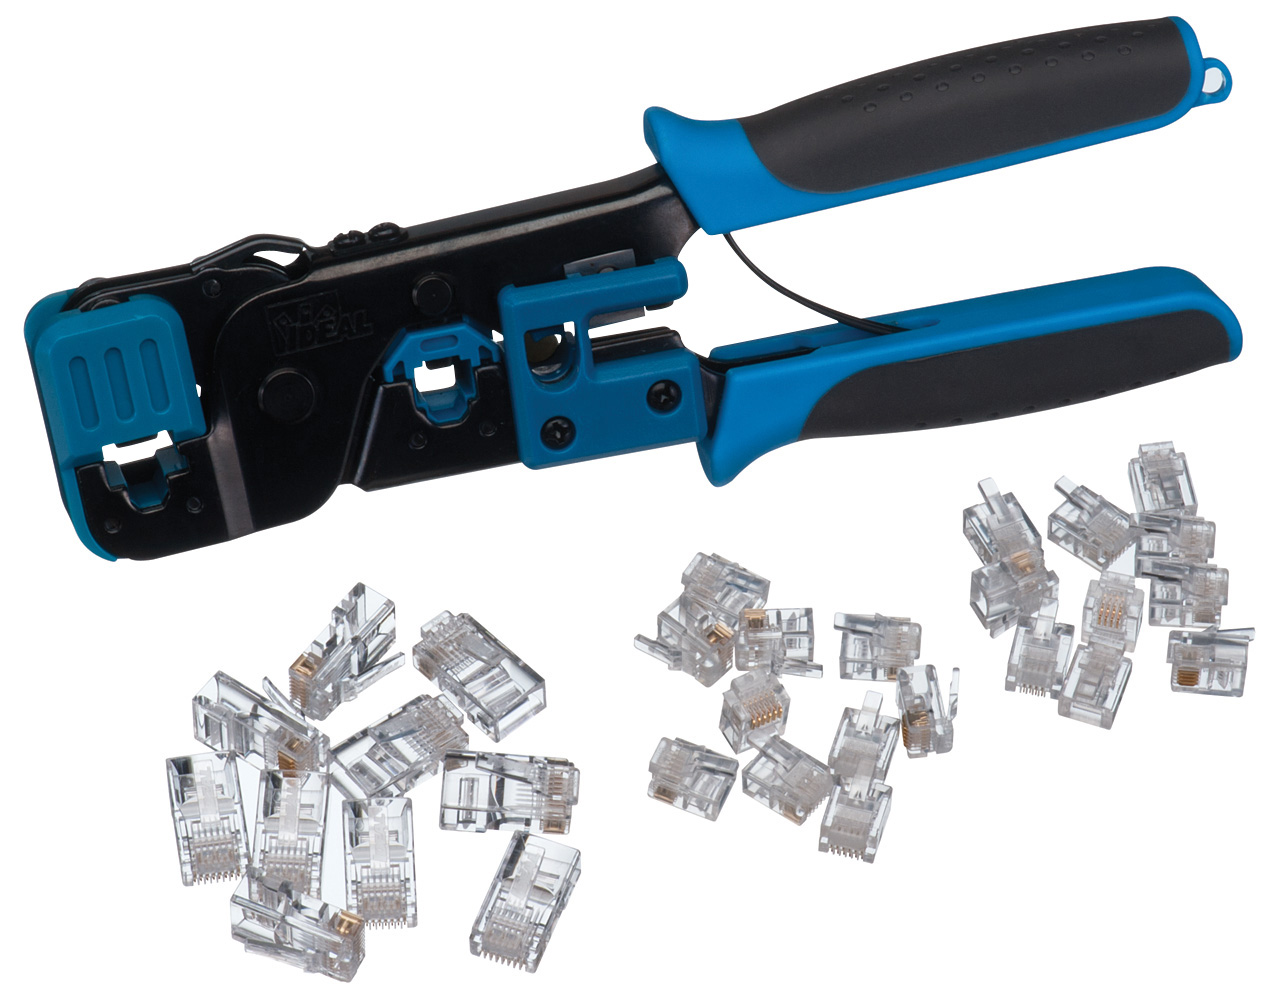 Tstl3a Holland Electronics Llc Cable Ringer Pocket Cbl